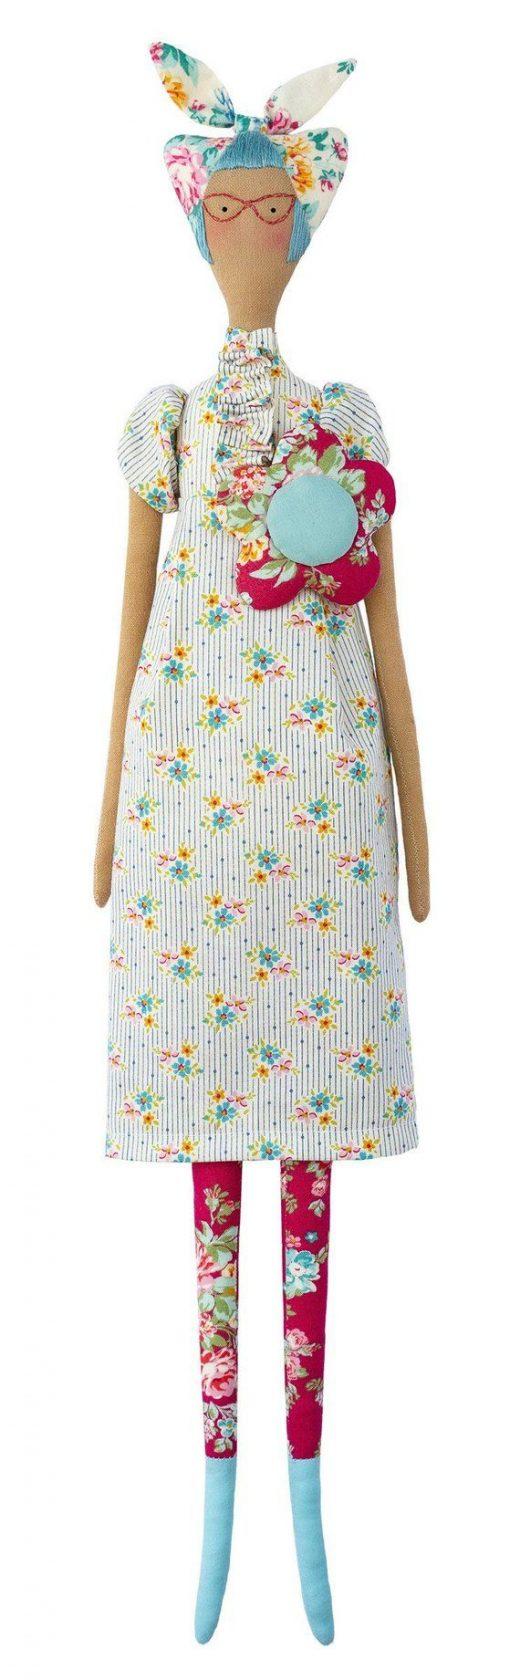 Tilda Apple Butter Kitschy Friends Sewing Kit | 22.5″ Tall | Tilda Quilt Fabric Bundle | Tilda Doll Kit | Gift